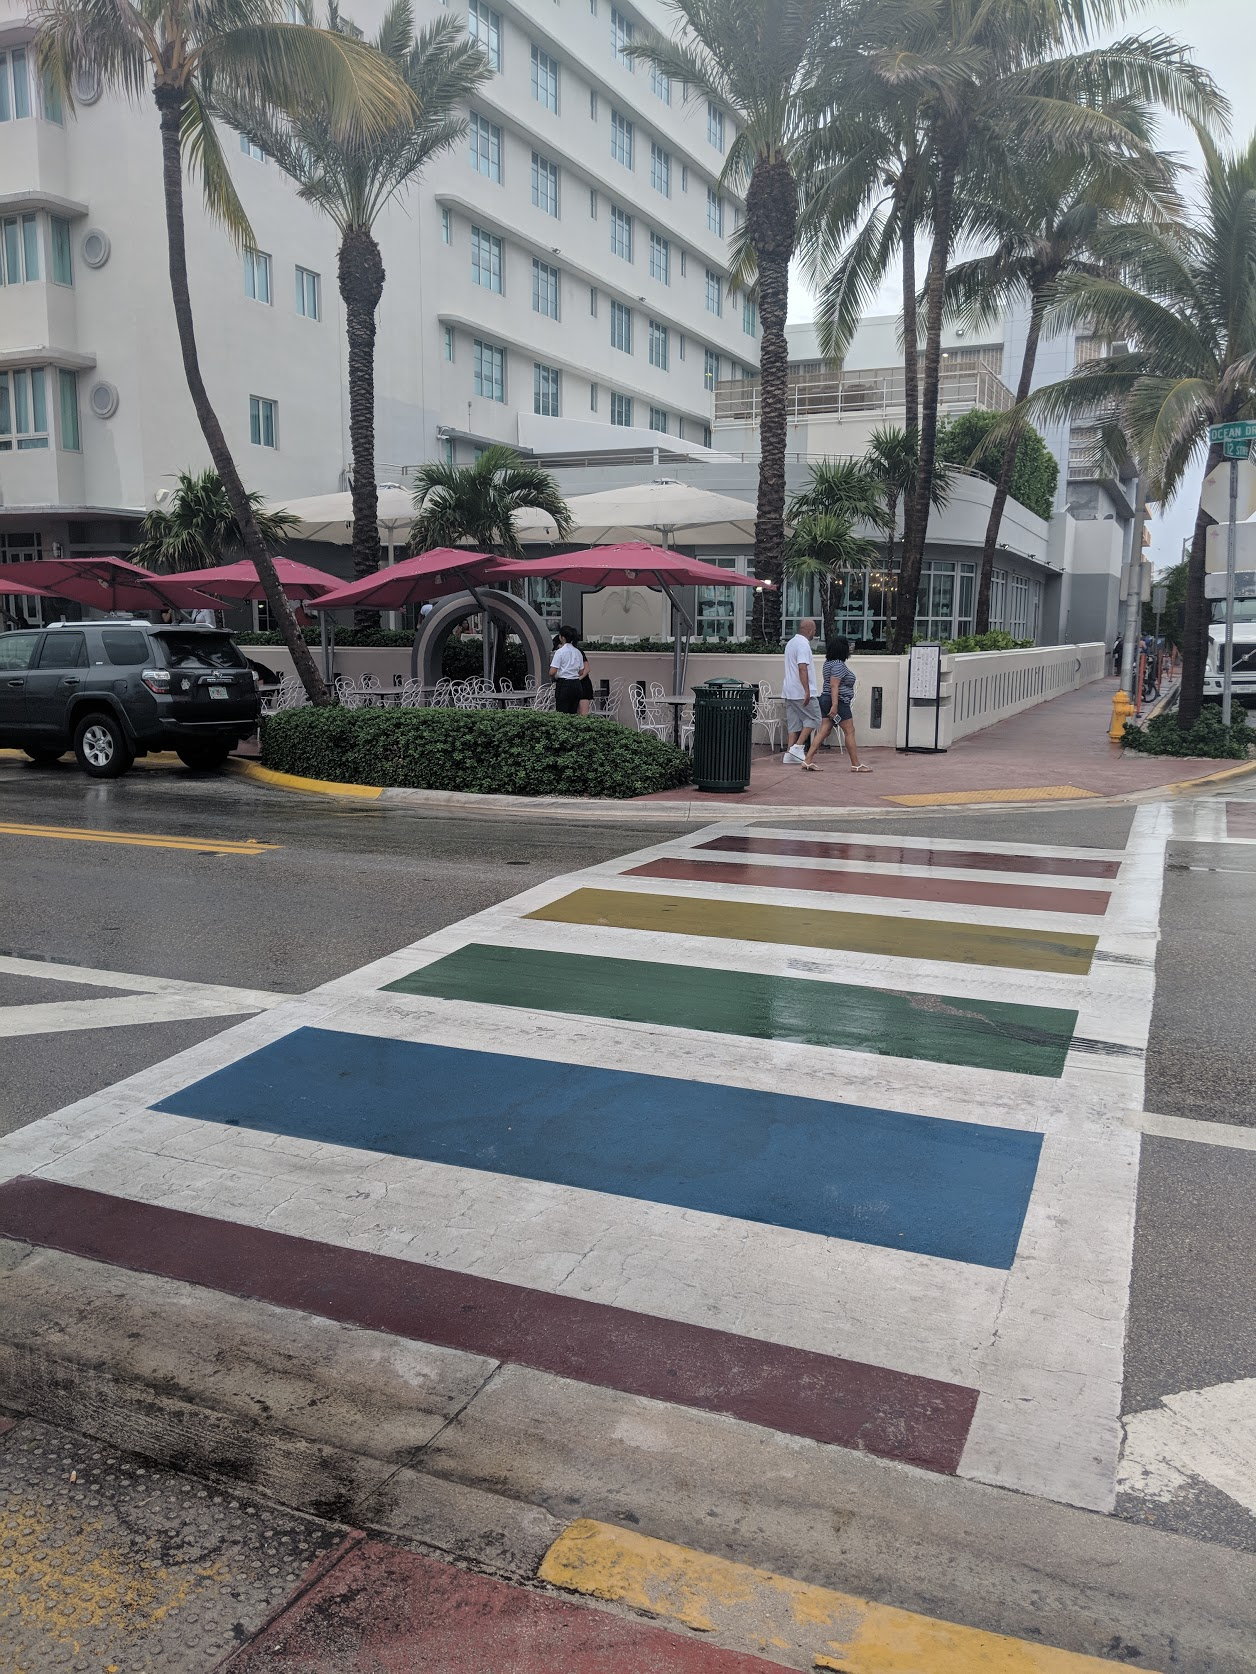 - Everywhere should have one: a rainbow crosswalk.